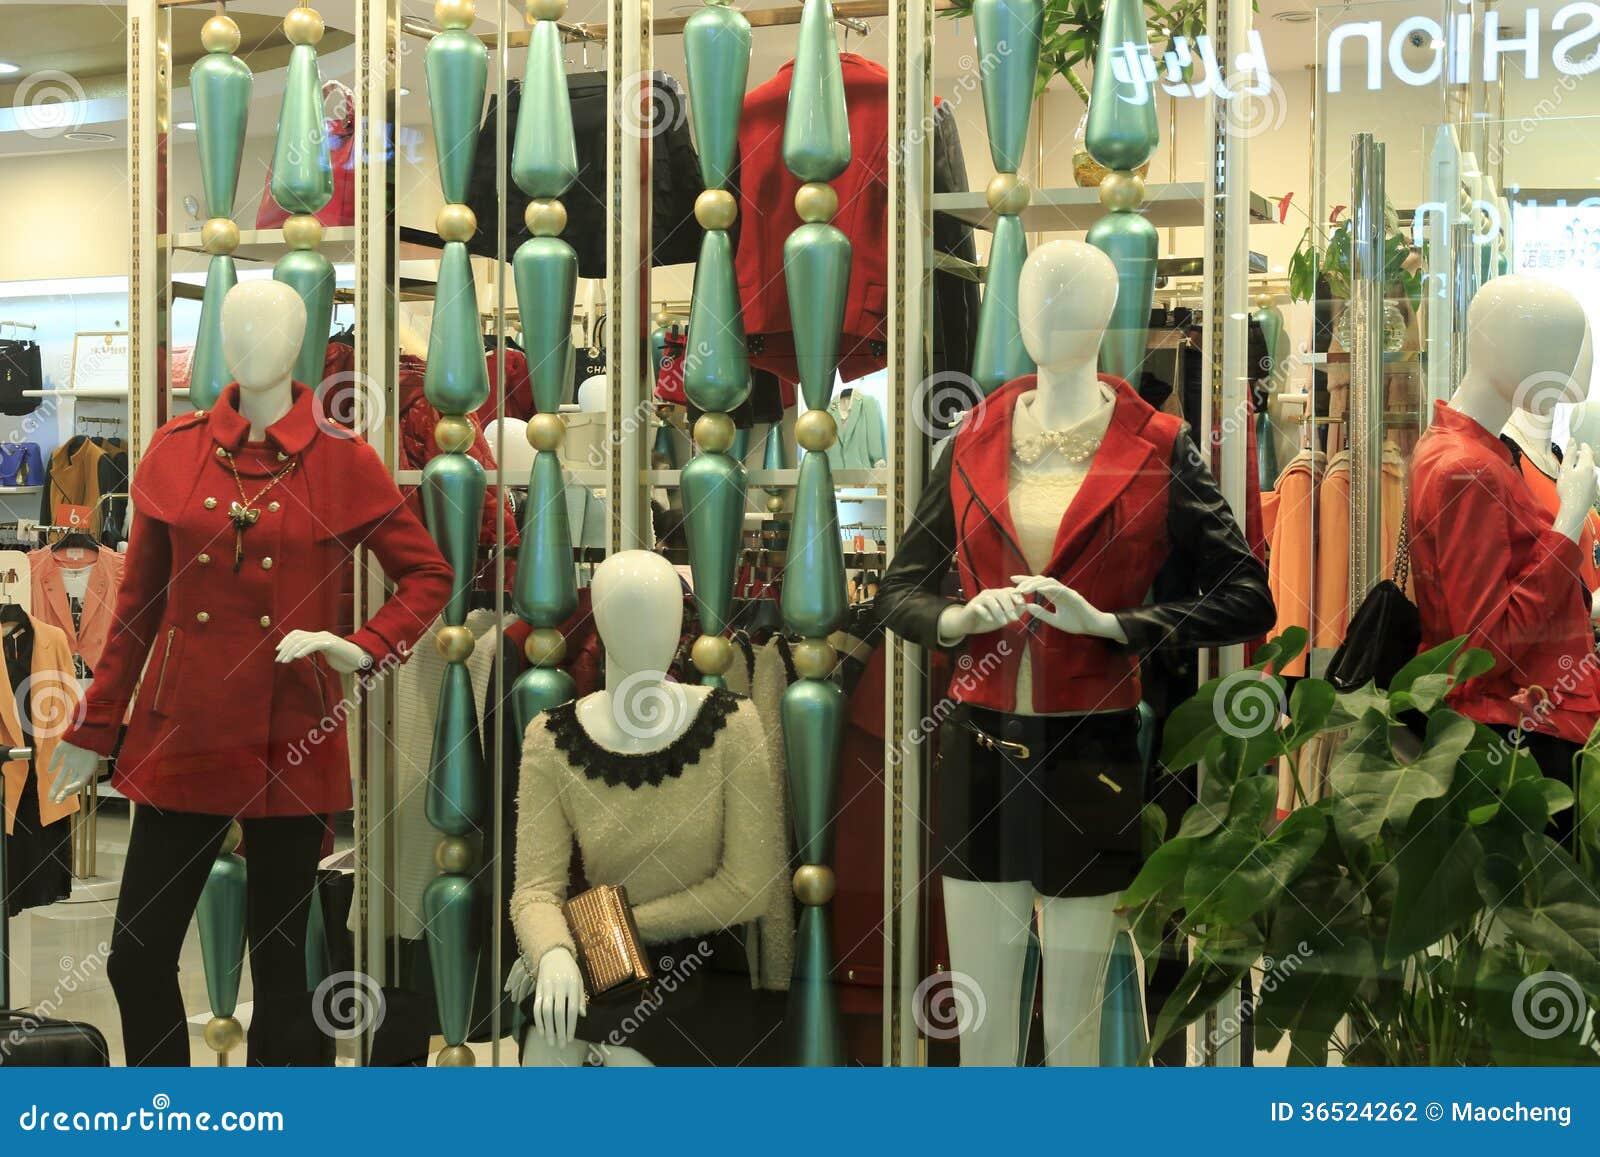 Tesco clothing stores locator